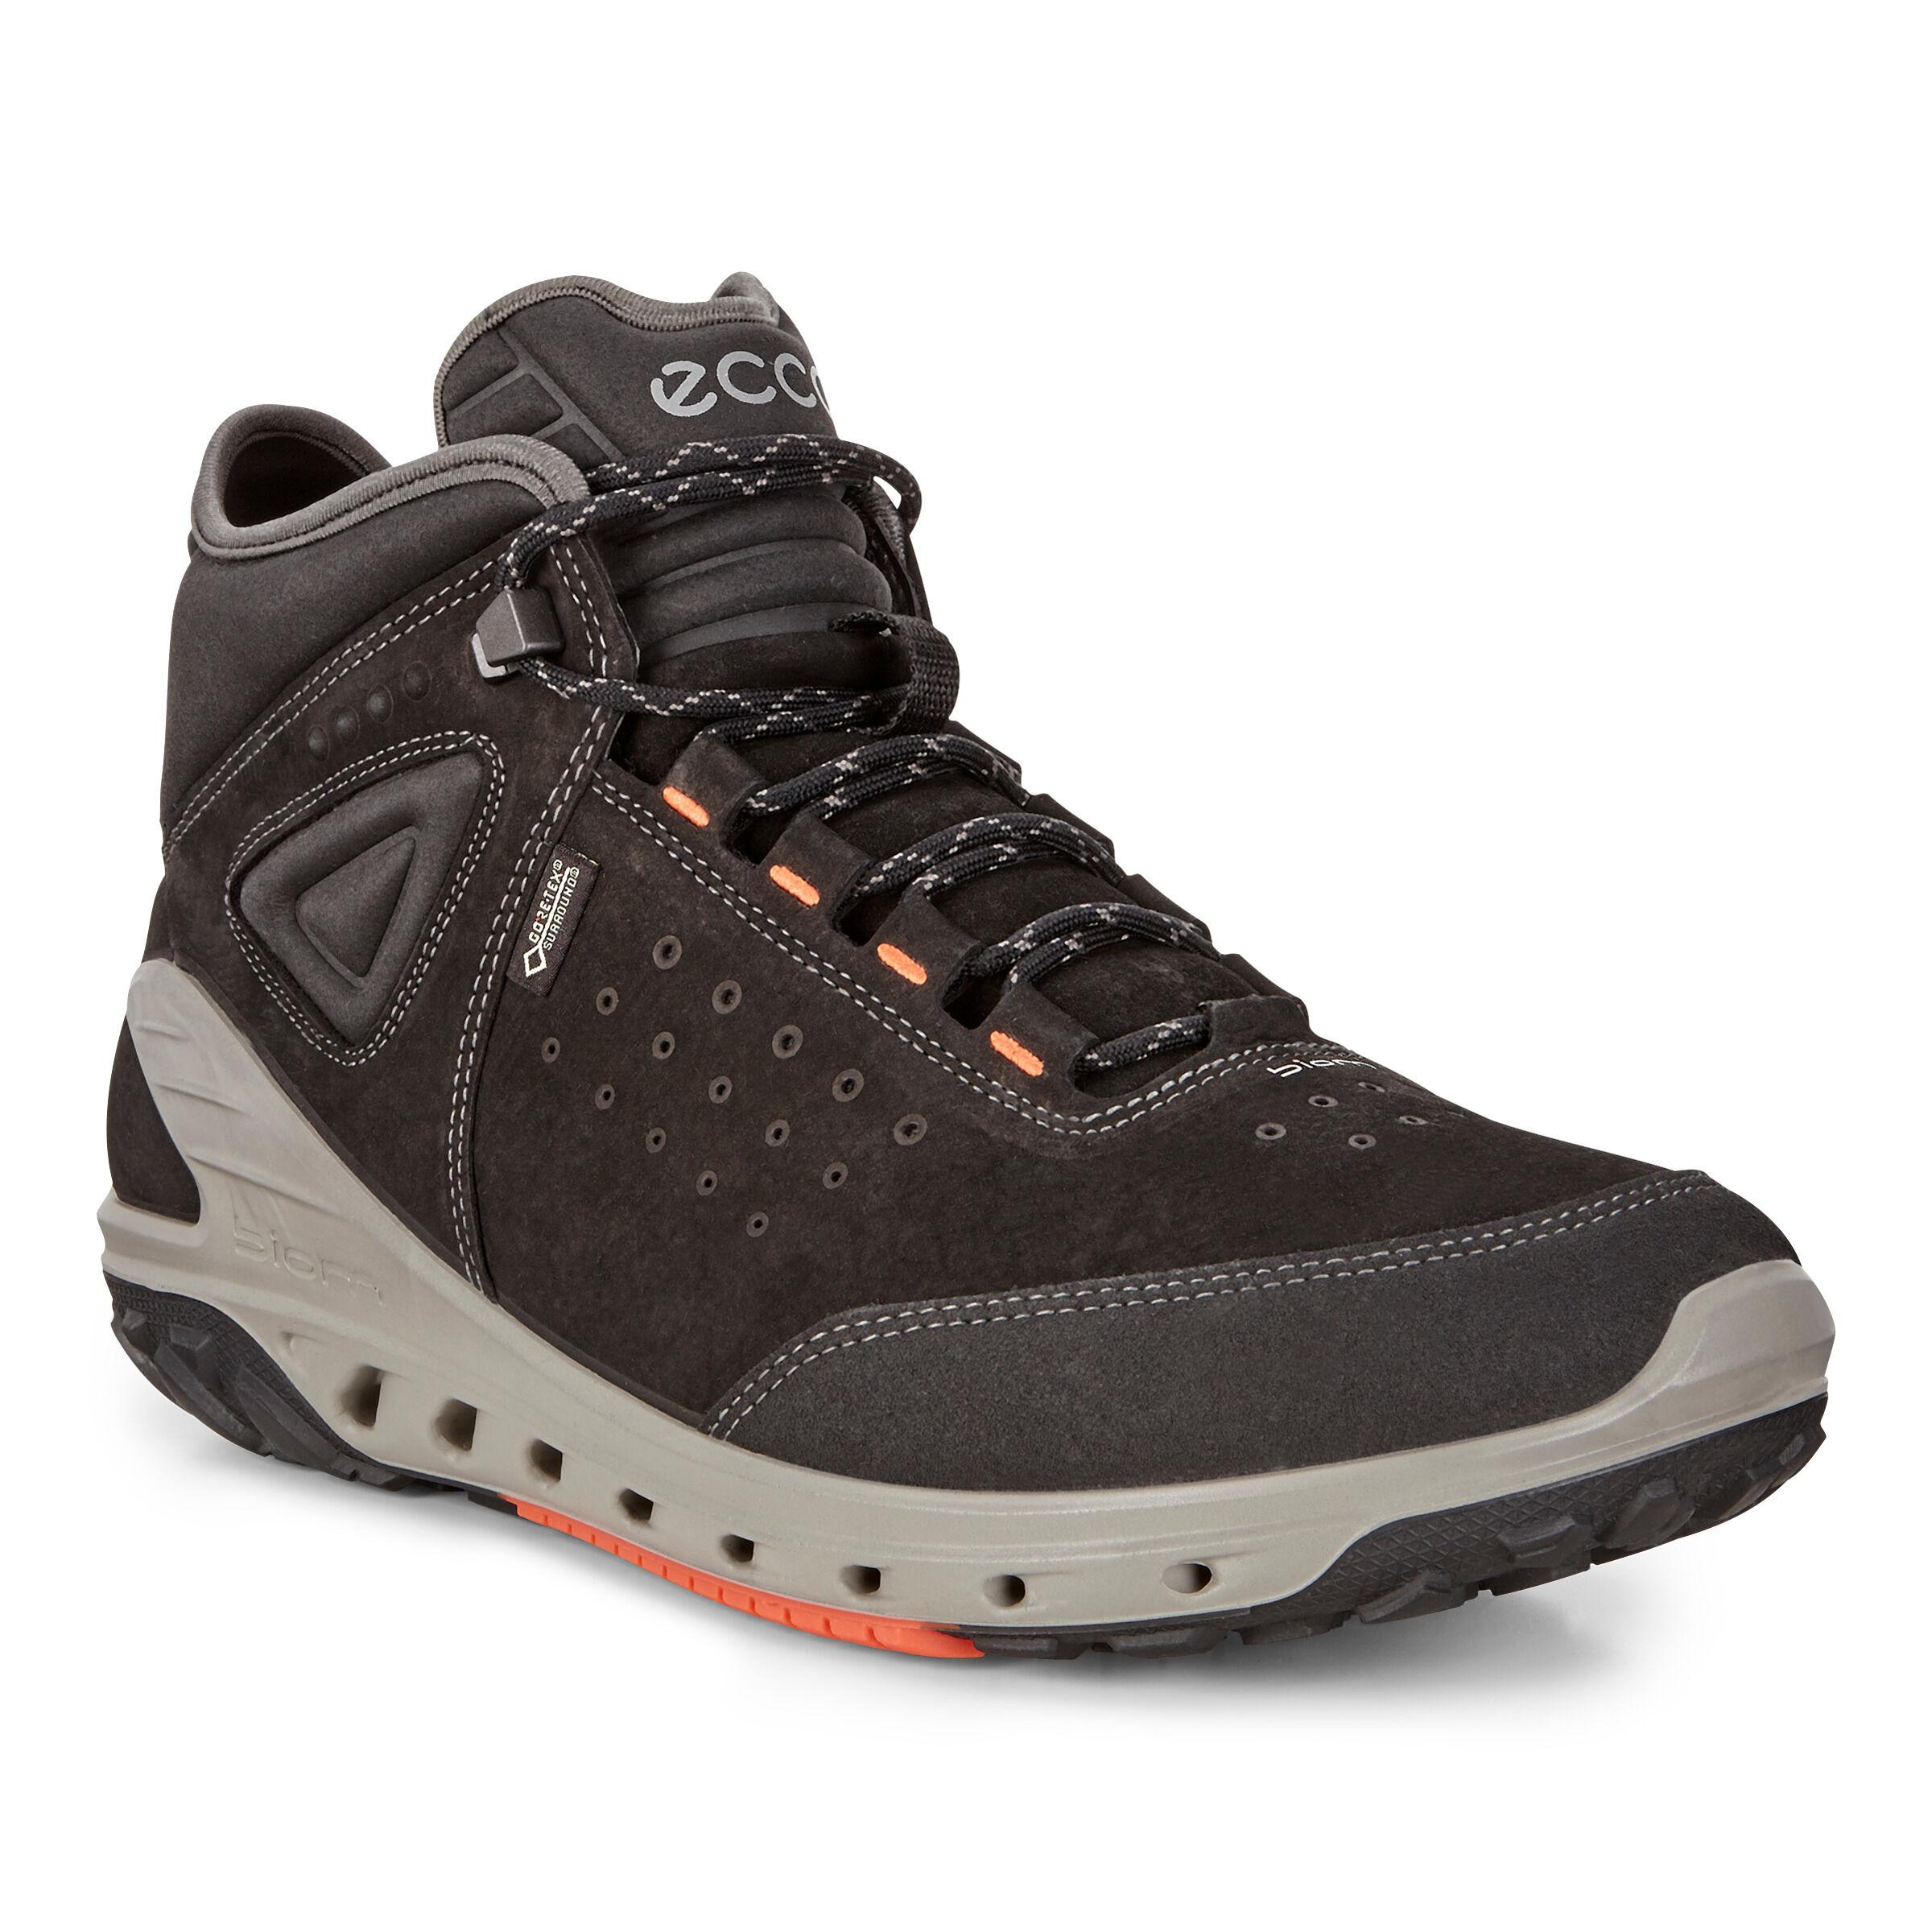 Ecco Biom Venture Mid GTX Men Herren Gore Tex Schuhe Natural Motion 820734 51707